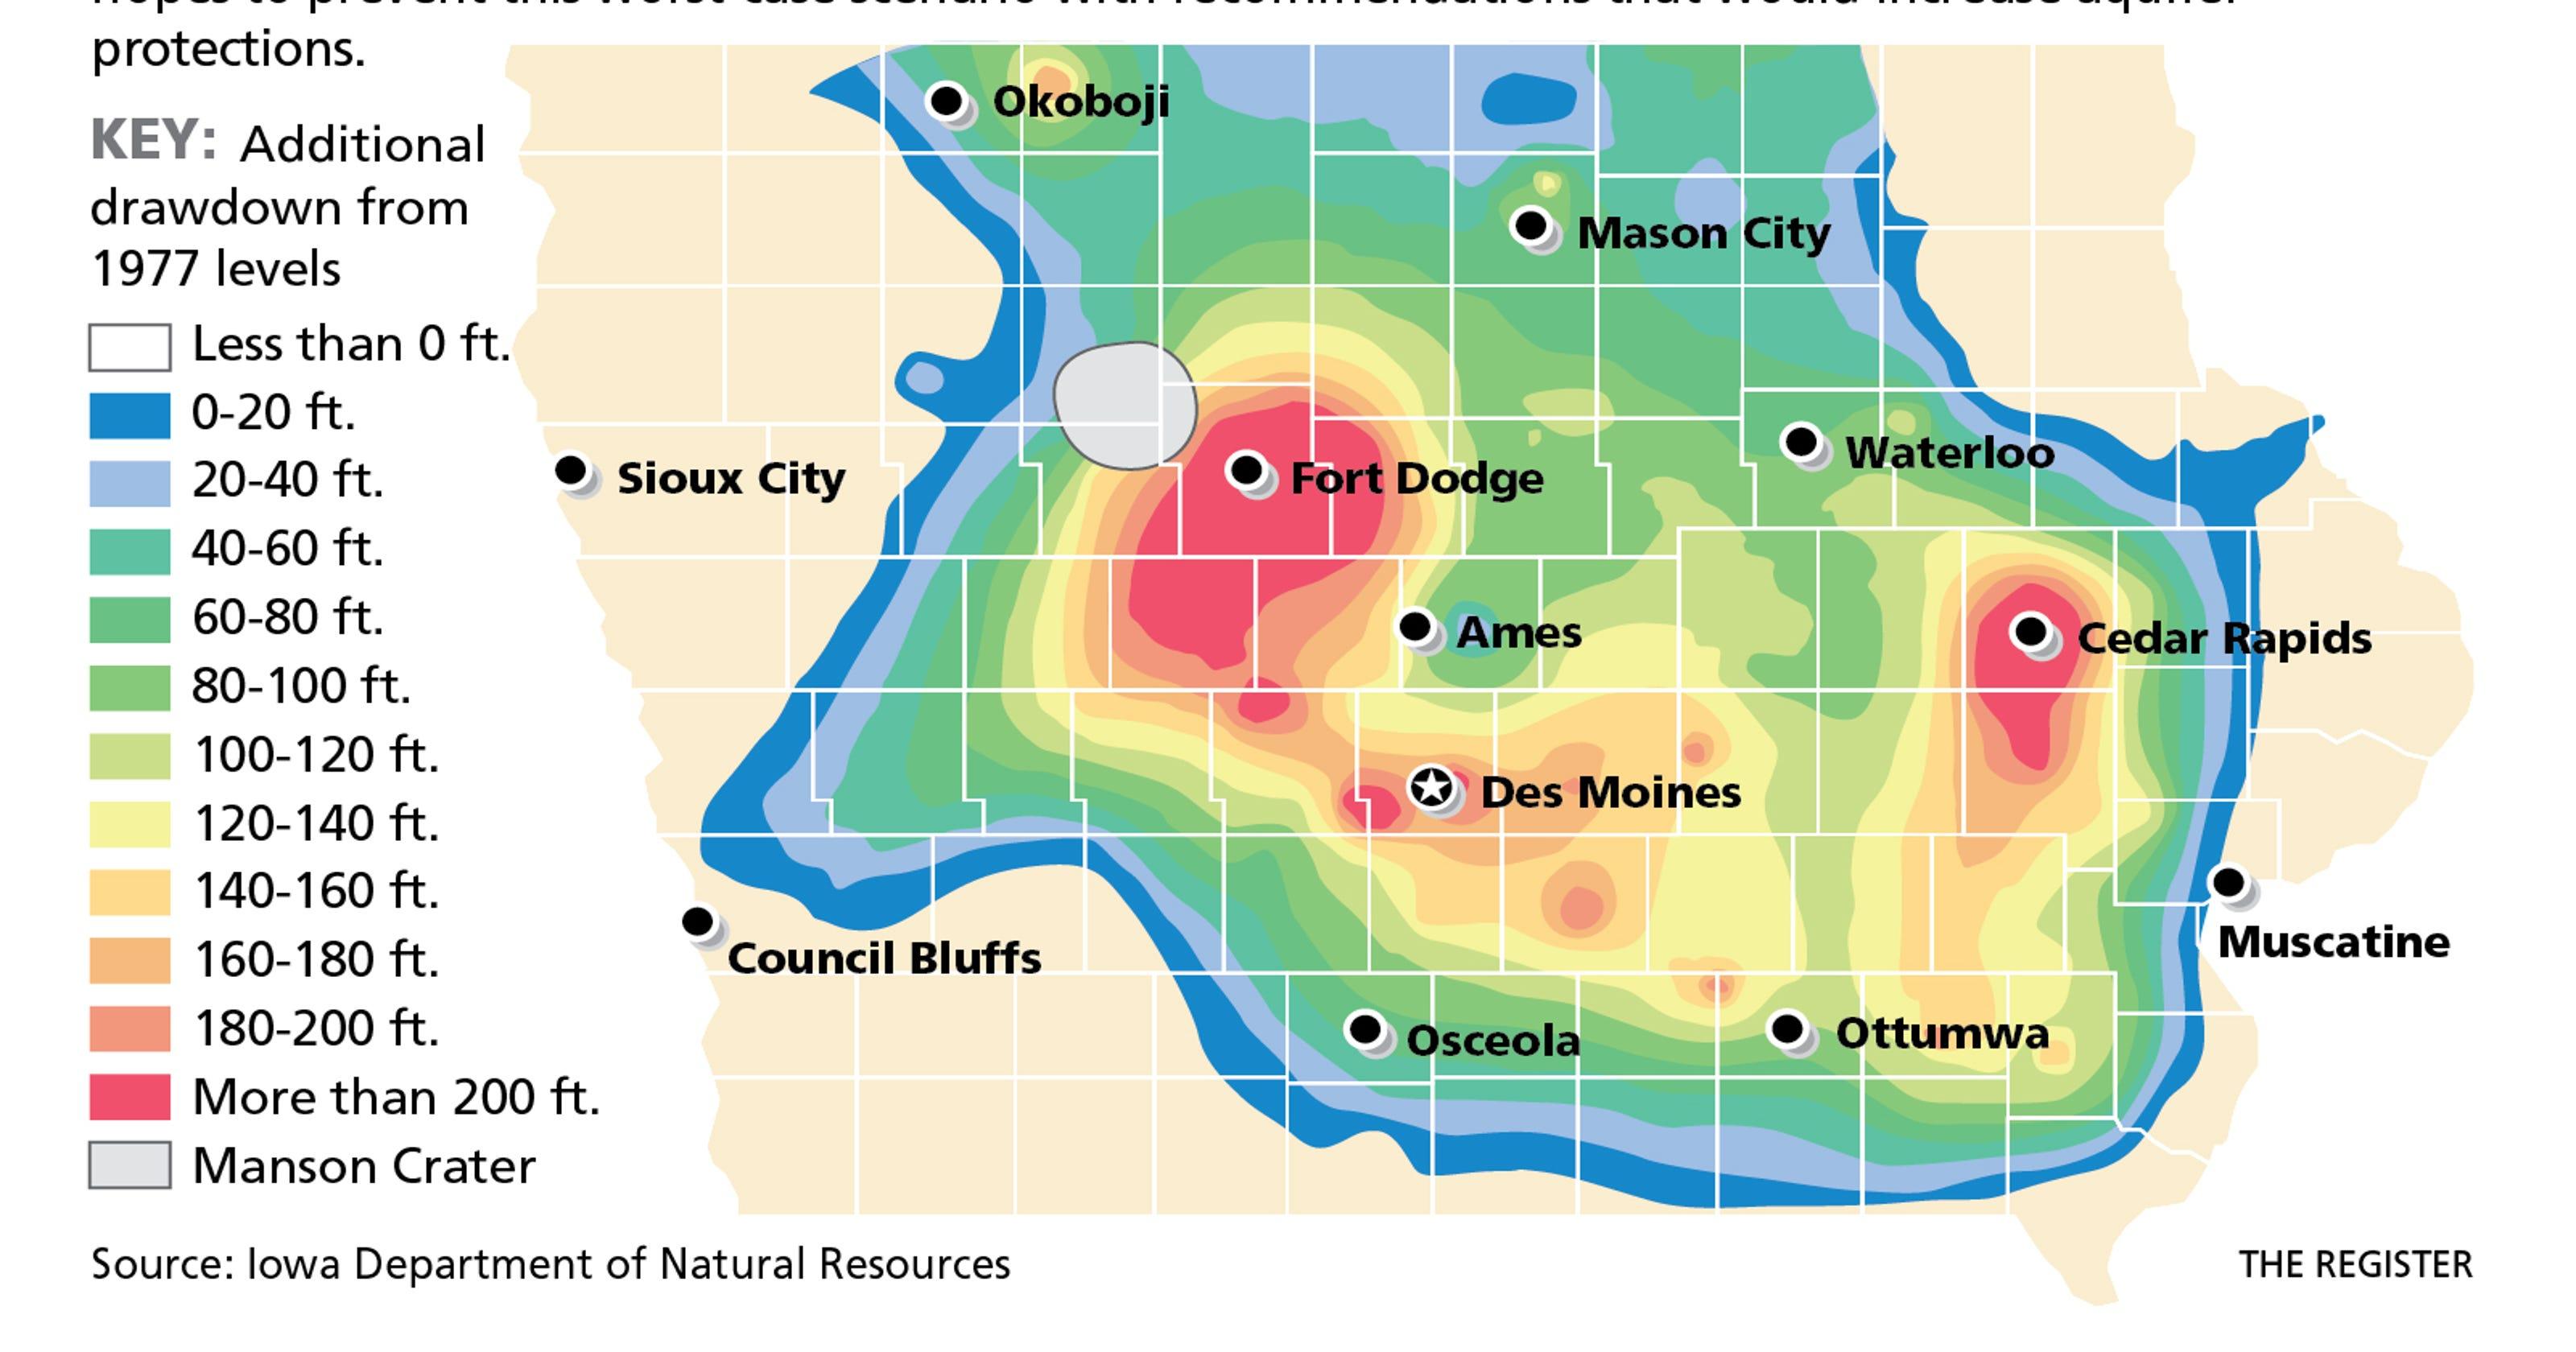 Growing water use threatens to strain Jordan aquifer on mn stream maps, mn lake maps, mn watershed maps, mn glacier maps, mn soil maps, mn water maps, mn river maps, mn elevation maps, mn climate maps,